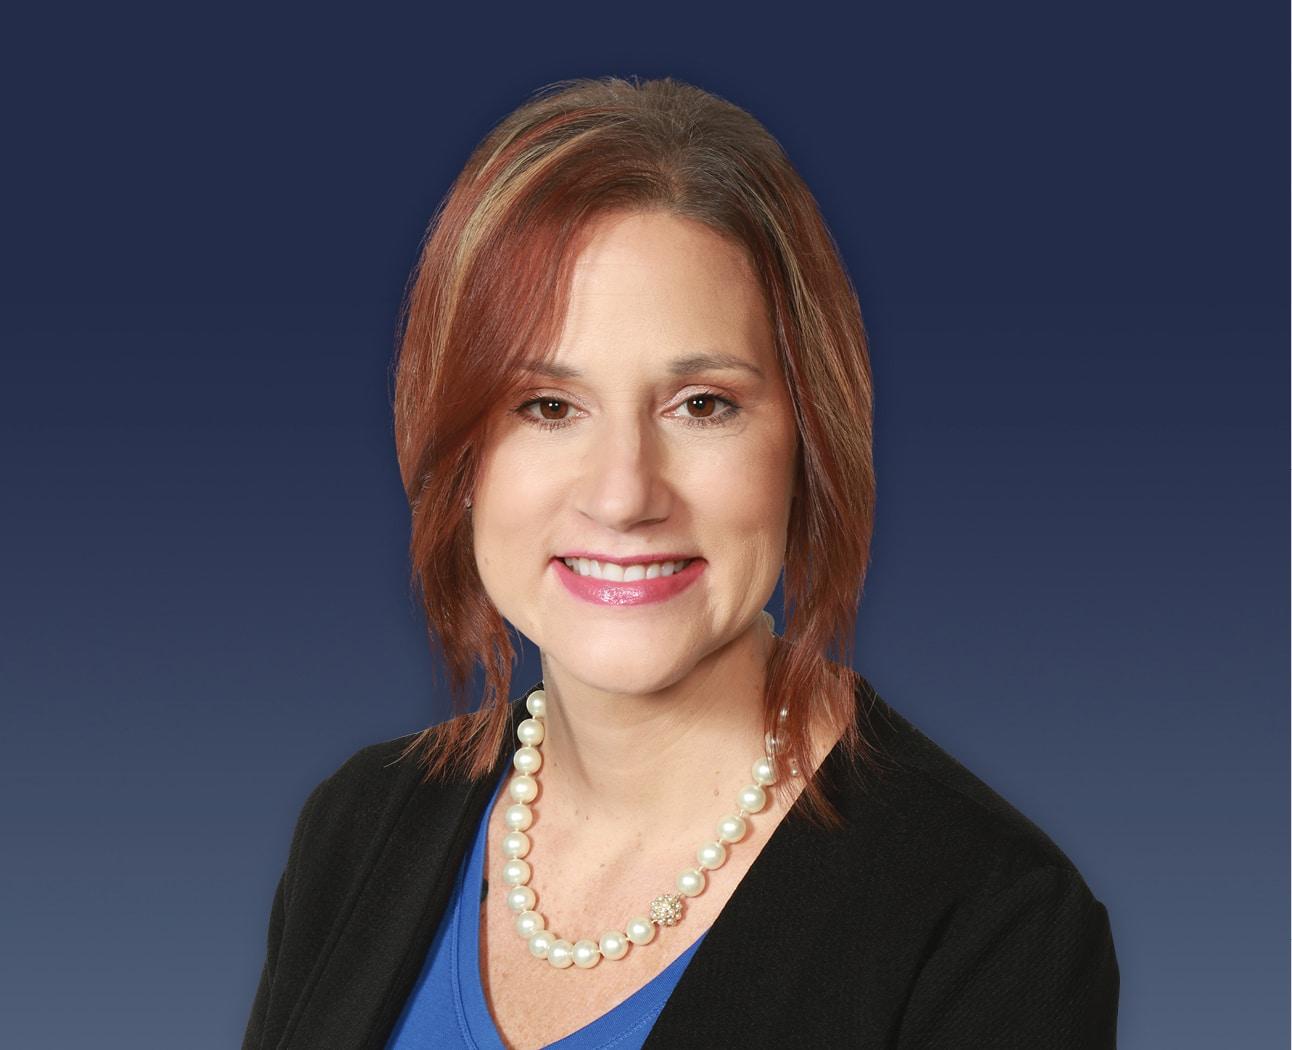 Tina Ehrenkaufer